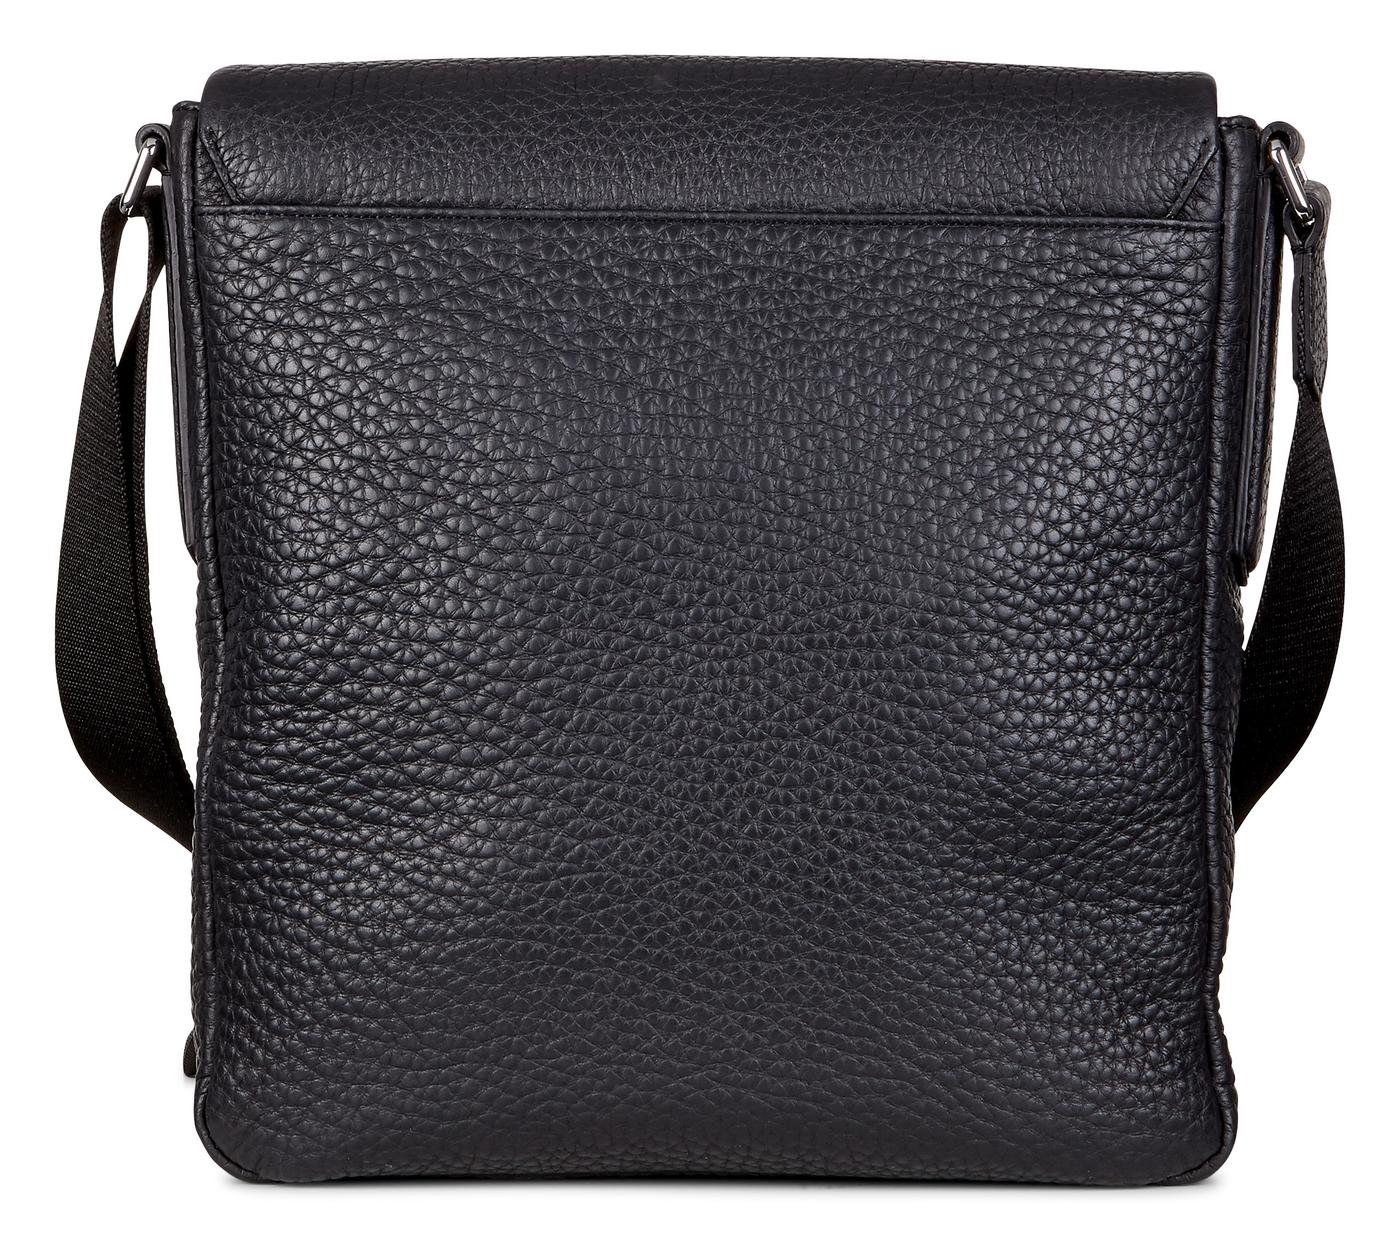 ECCO MADS Crossbody Bag